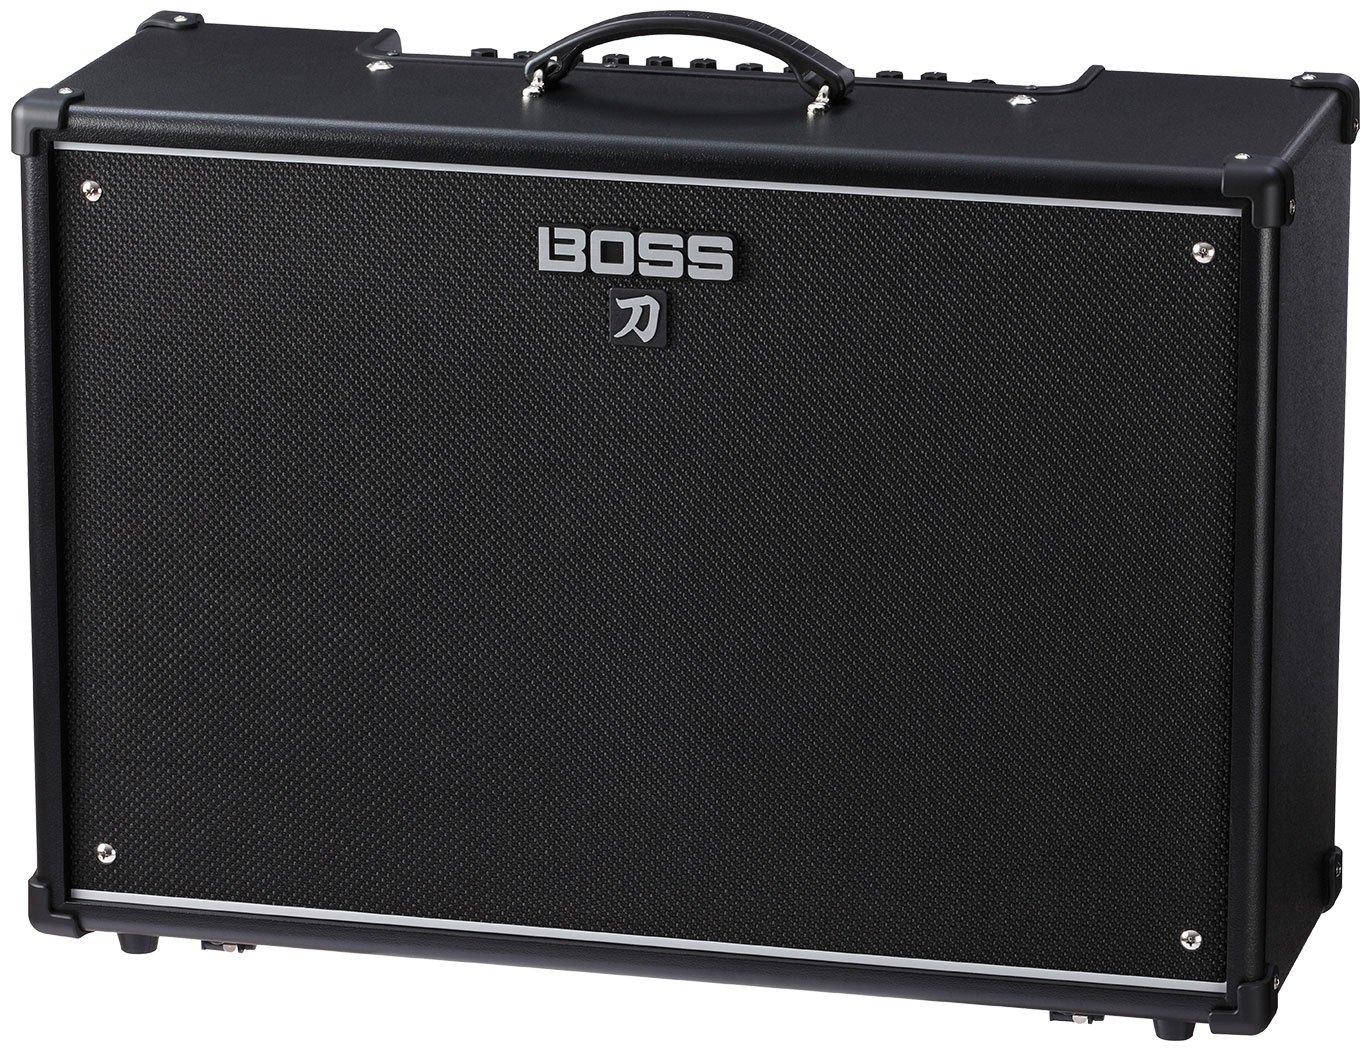 Boss KTN-100-212 Katana 100/212 Guitat Amplifier w/Bonus Strukture Instrument Cable SC186W & RIS Picks (x3) 761294509319 by Rock Island Sound